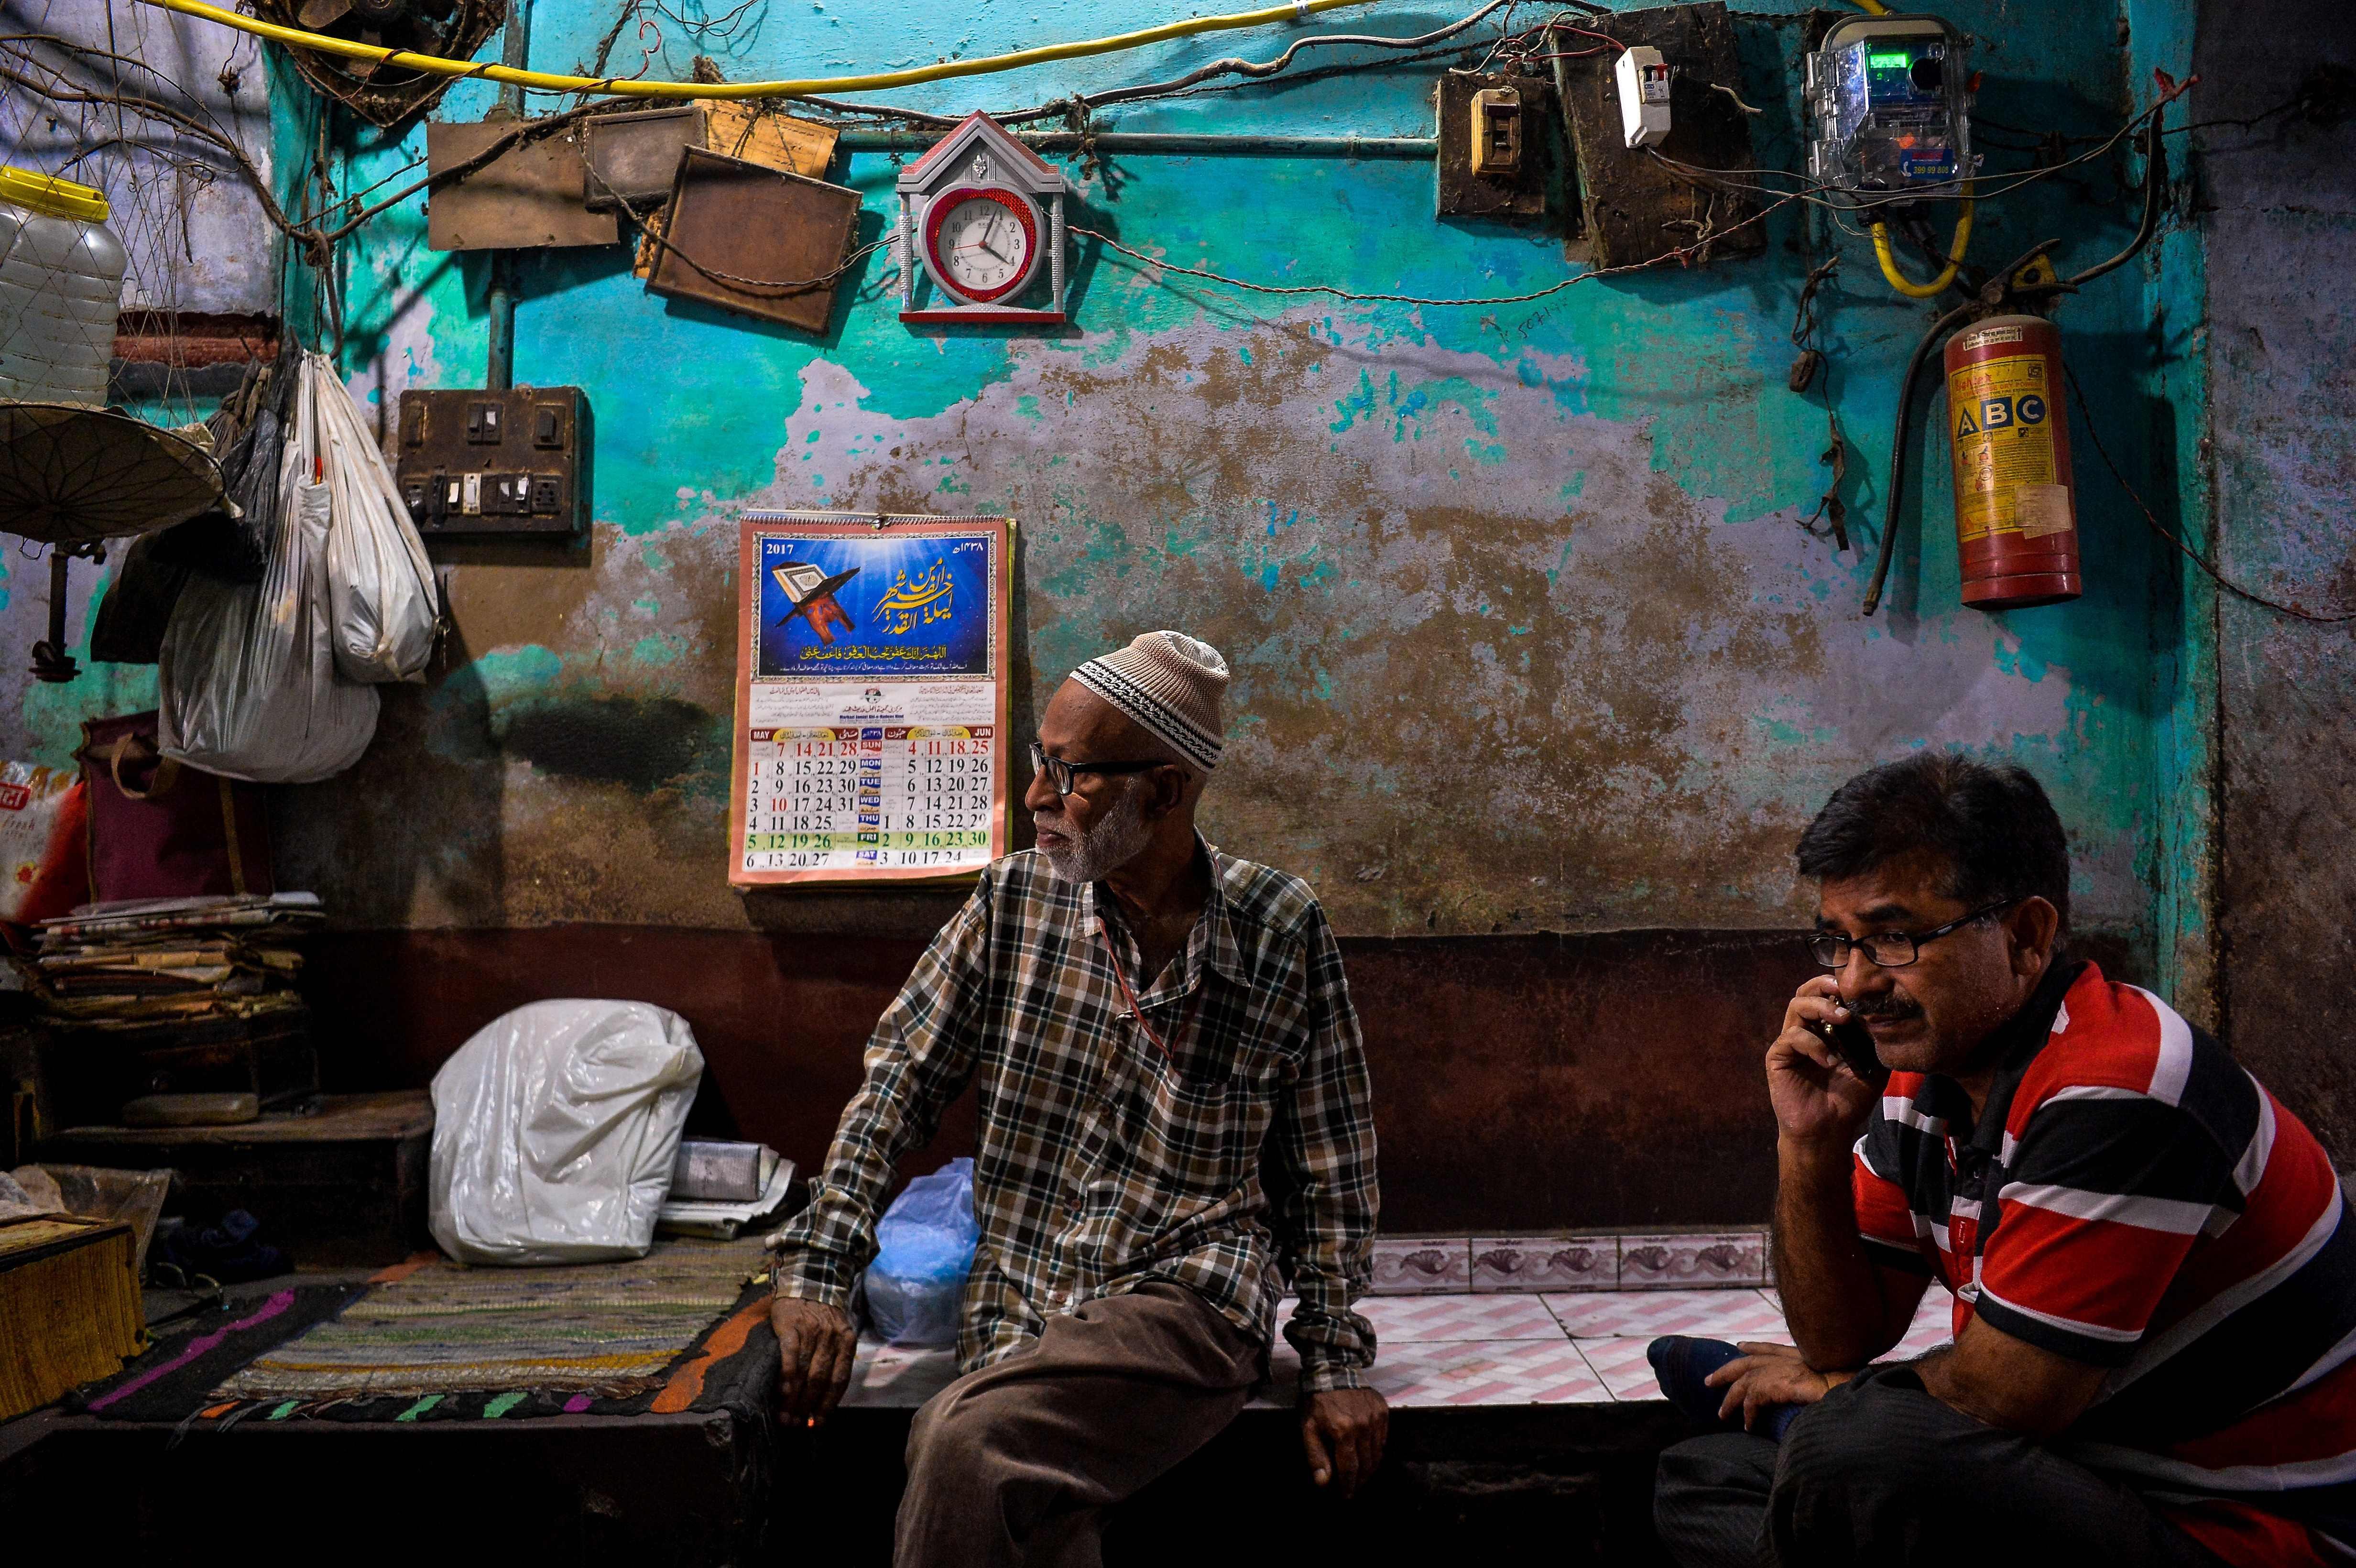 TOPSHOT - An elderly Indian shopkeeper sits as he waits for customers in New Delhi on May 3, 2017. / AFP PHOTO / CHANDAN KHANNA / TT / kod 444